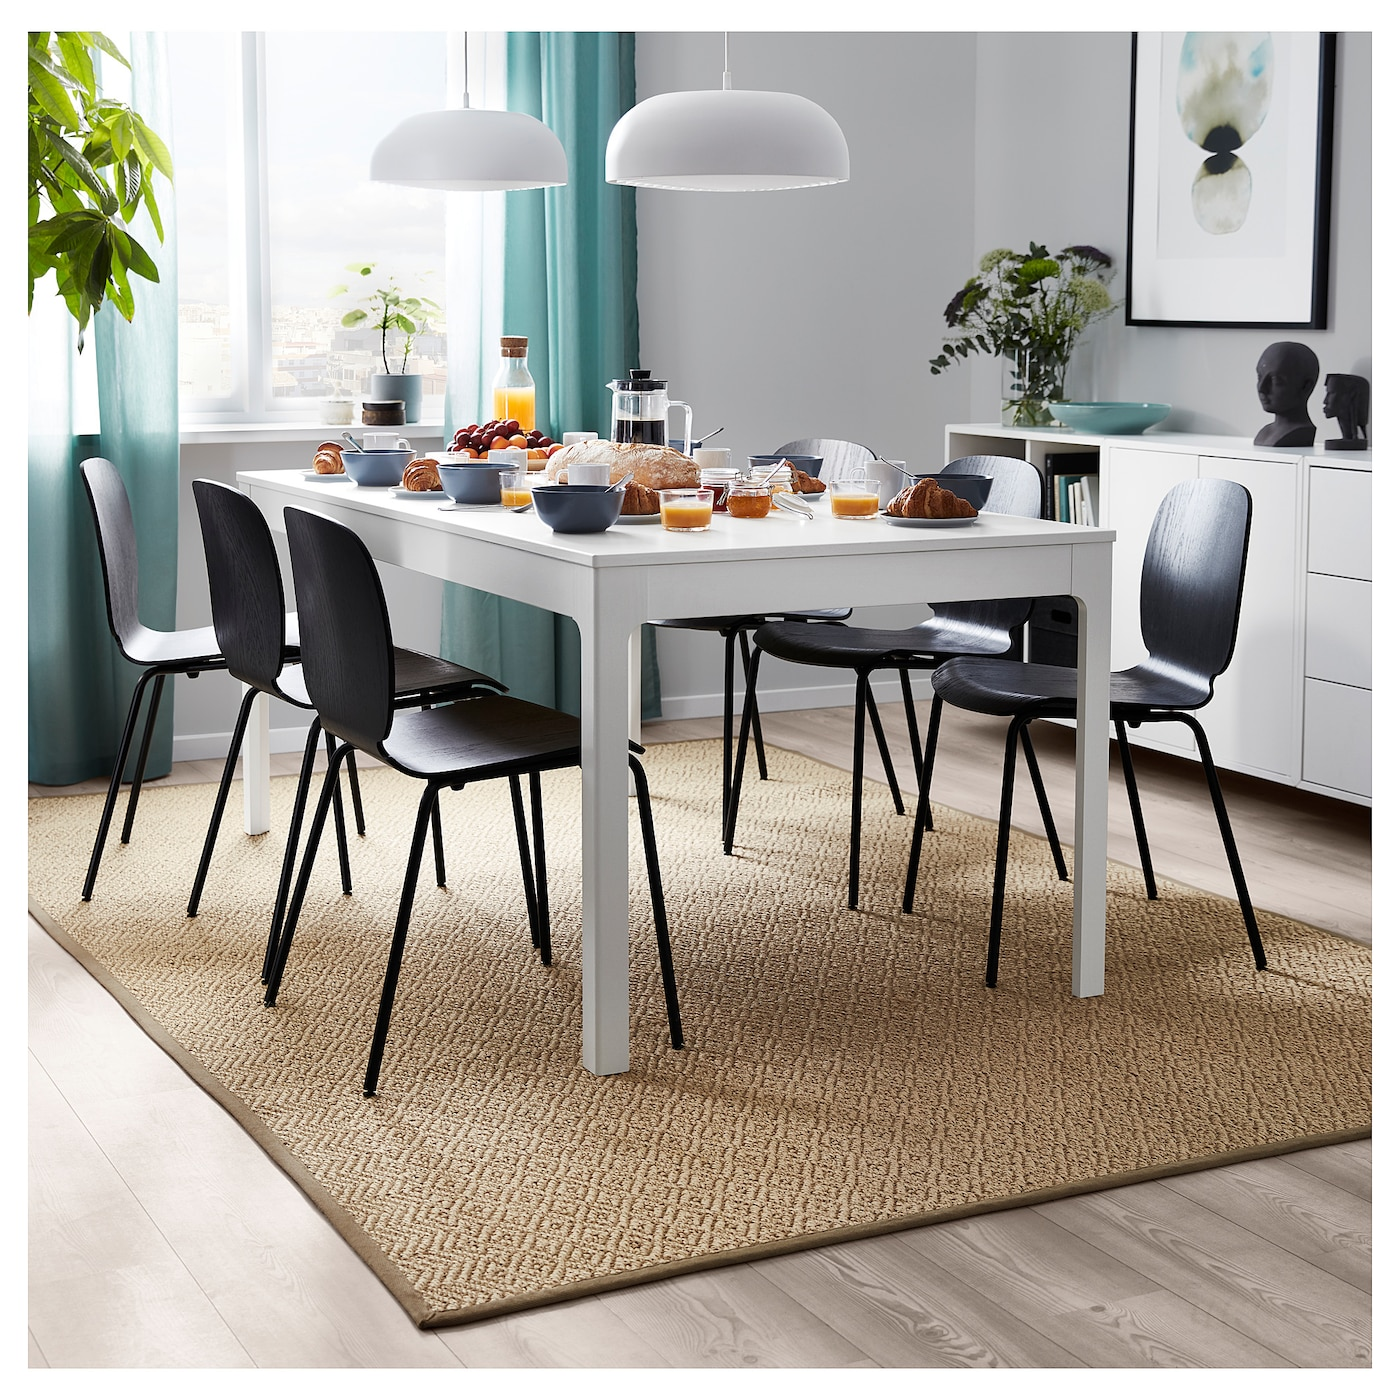 Vistoft Tapis Tisse A Plat Naturel 200 X 300 Cm Ikea